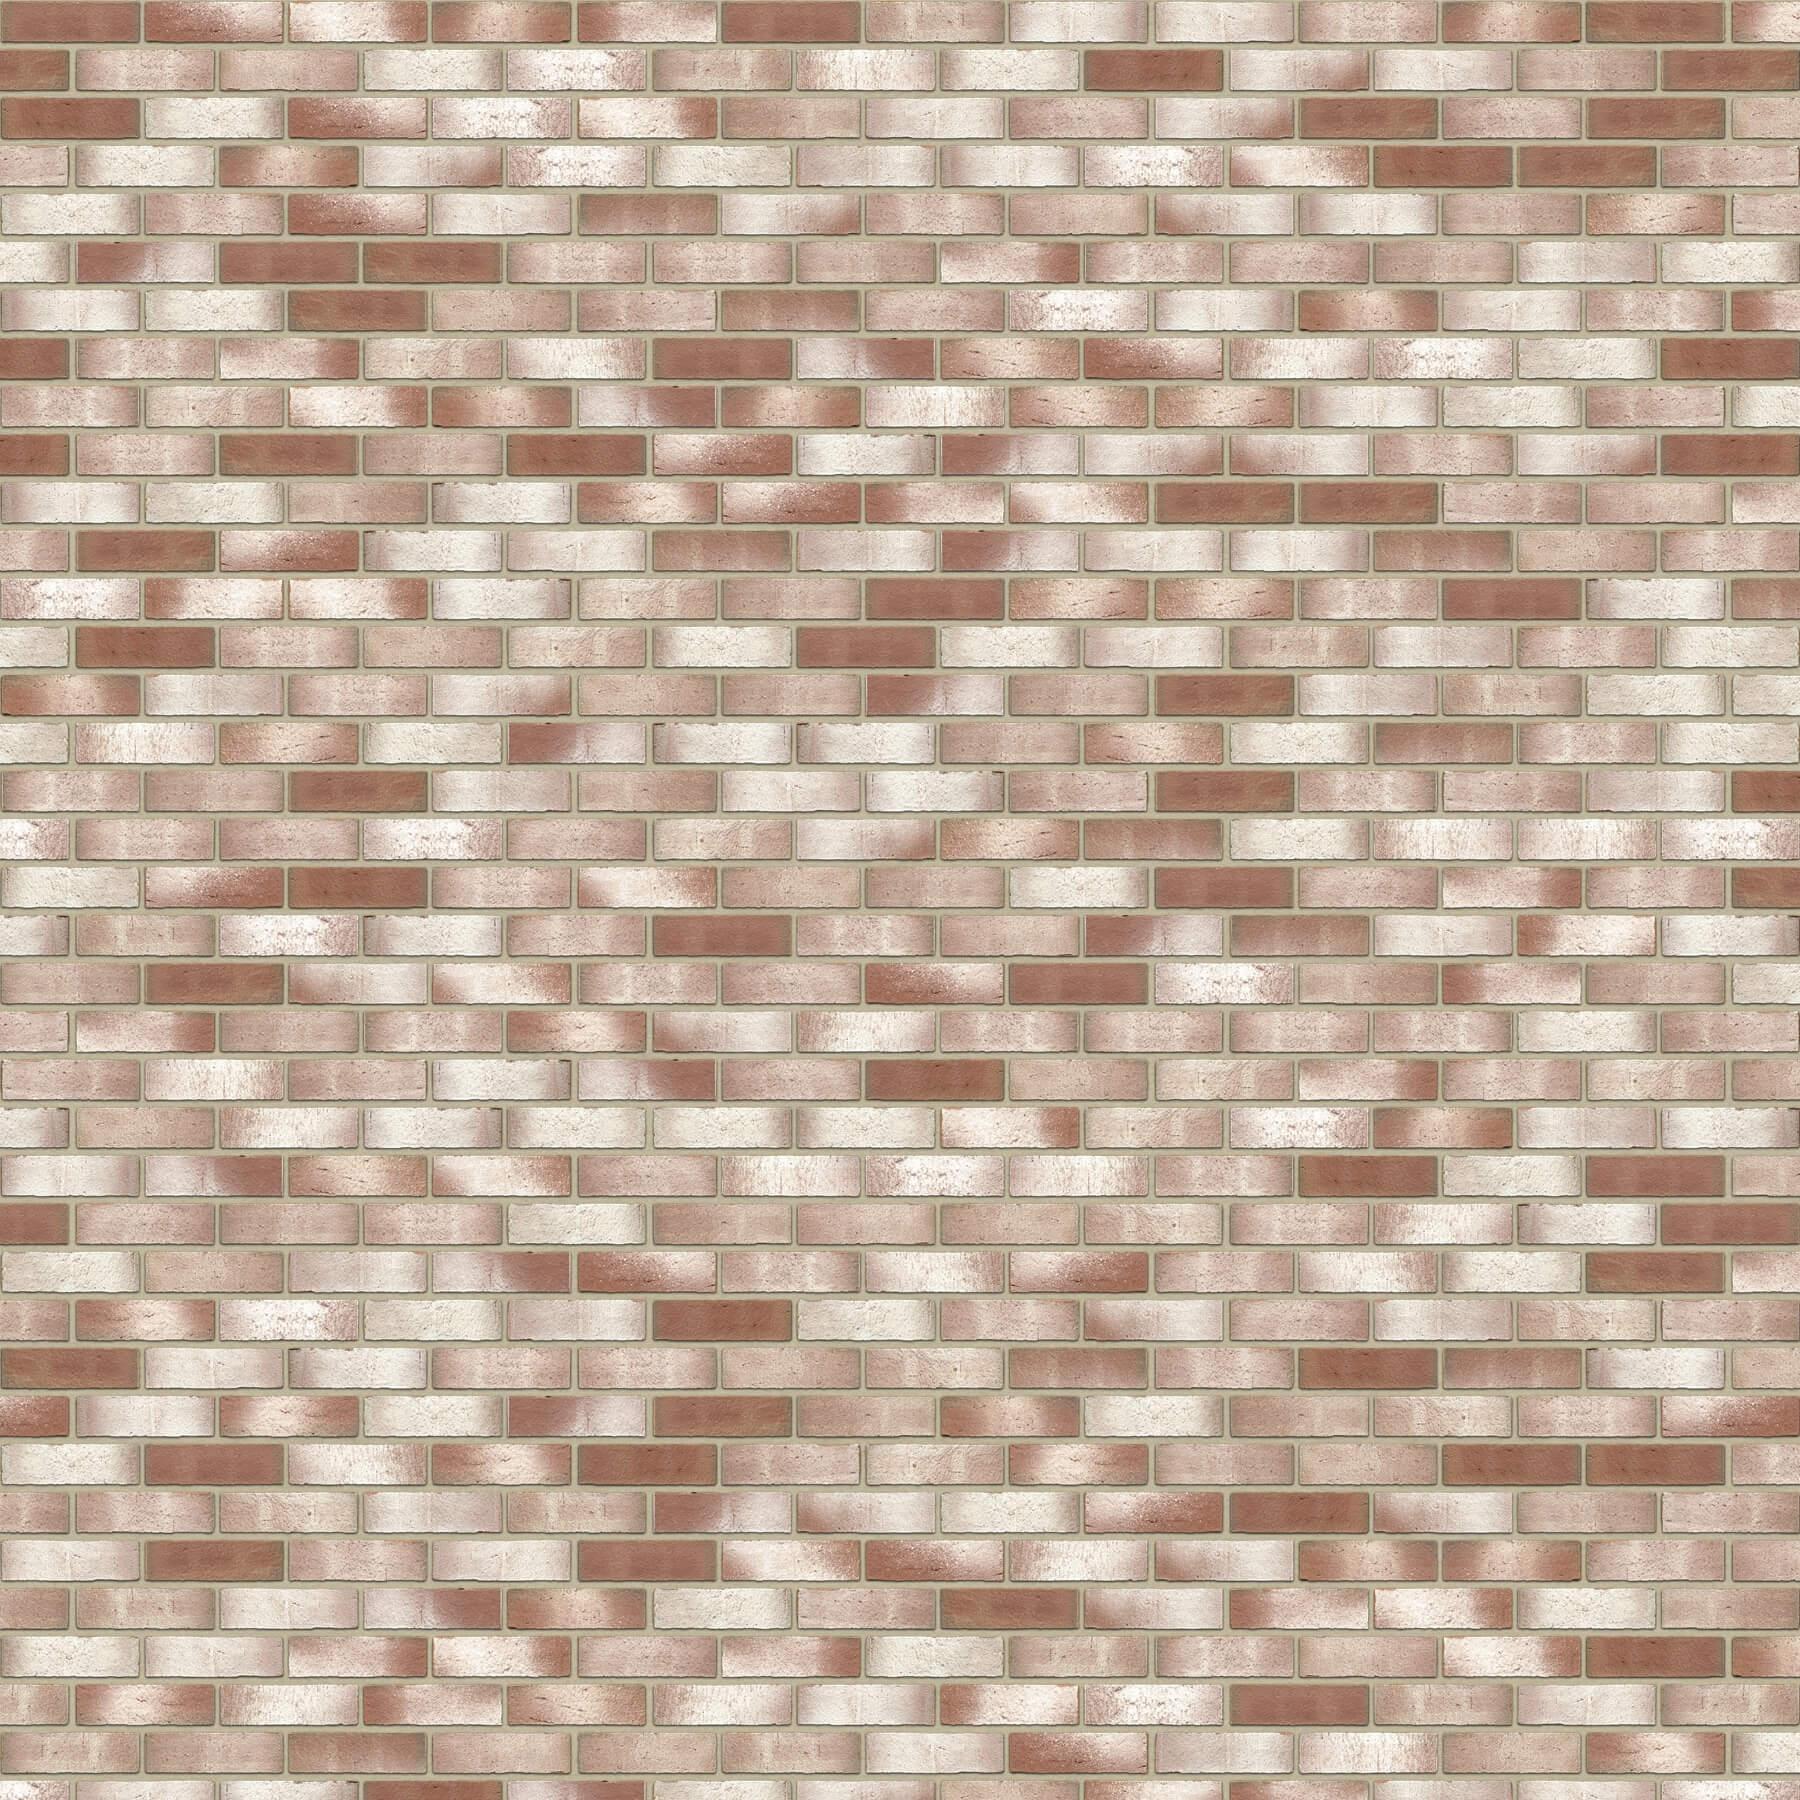 Puna-cigla-FeldHaus-Klinker-brick-house-beograd-nf-k-923-Bez Fuga